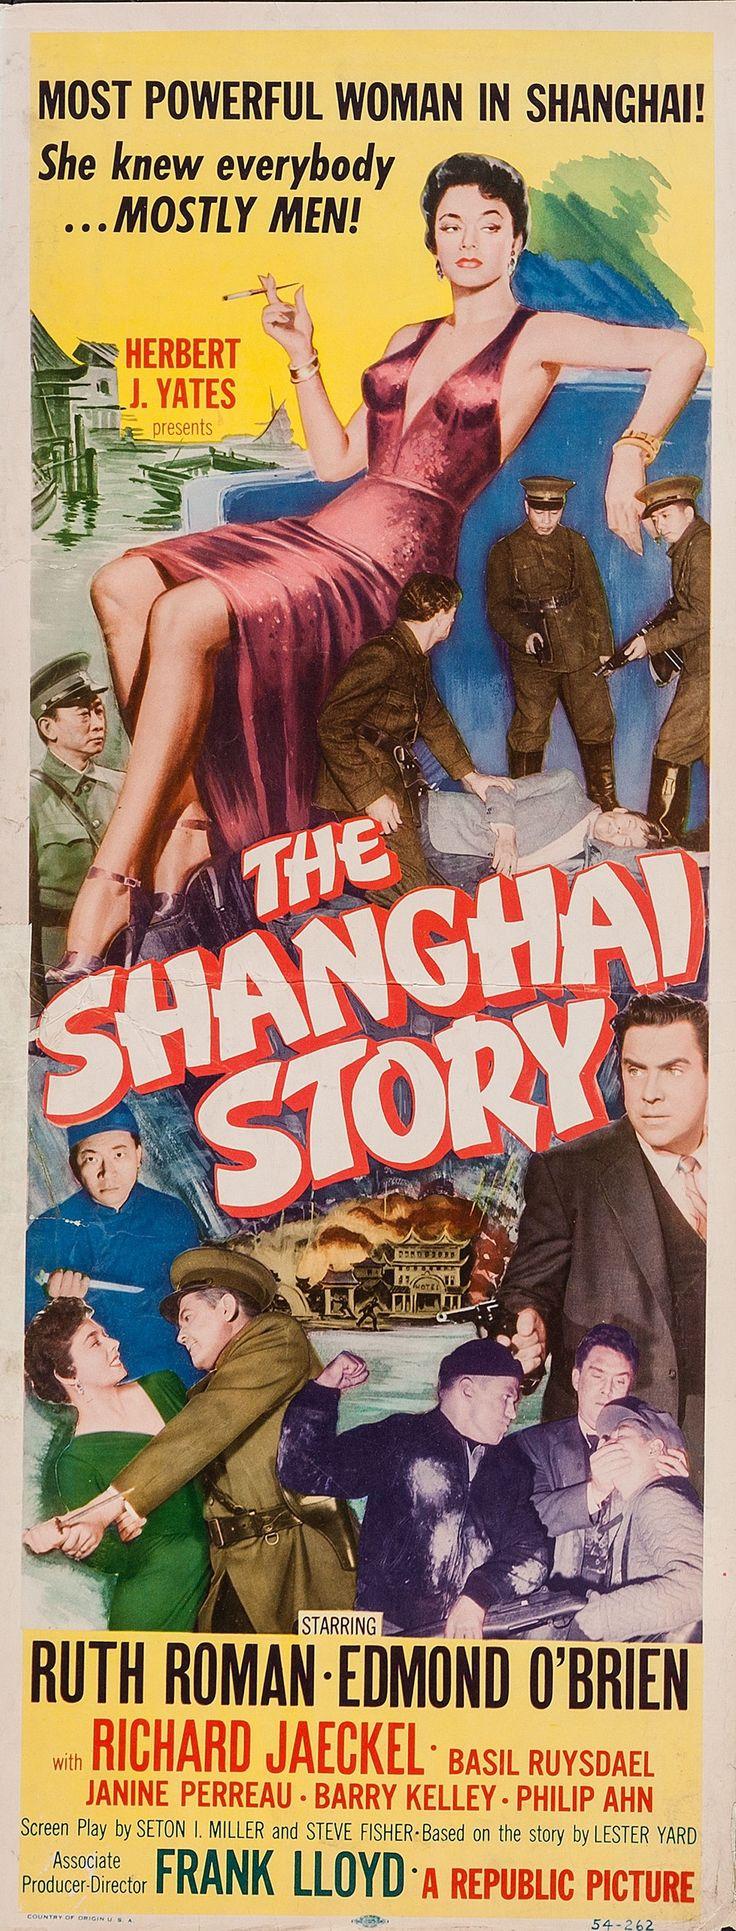 The Shanghai Story (1954) Stars: Ruth Roman, Edmond O'Brien, Richard Jaeckel, Whit Bissell, James Griffith ~ Director: Frank Lloyd